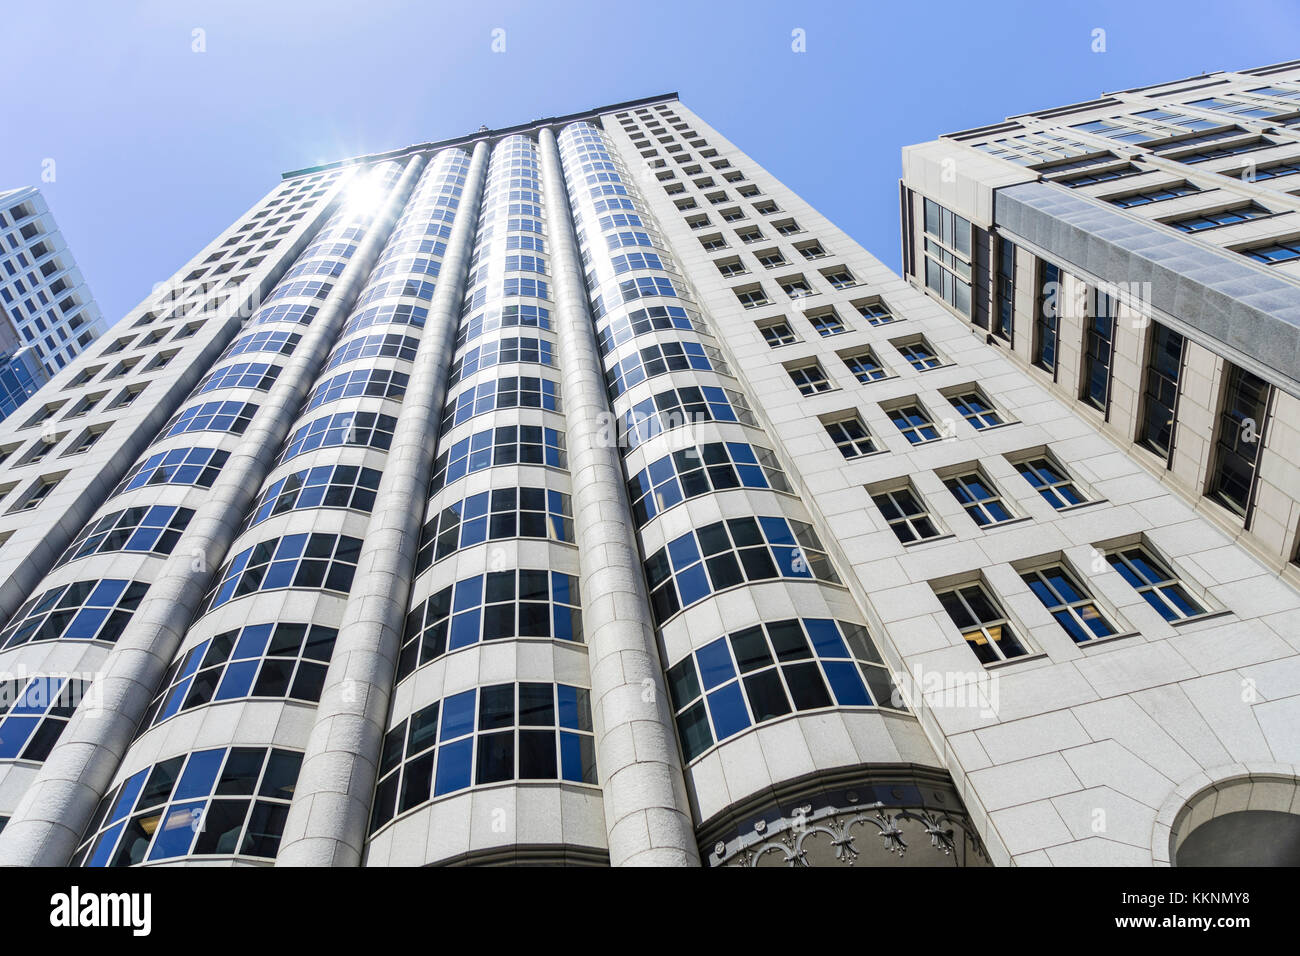 Modern Architecture, Downtown, San Francisco, California, USA - Stock Image